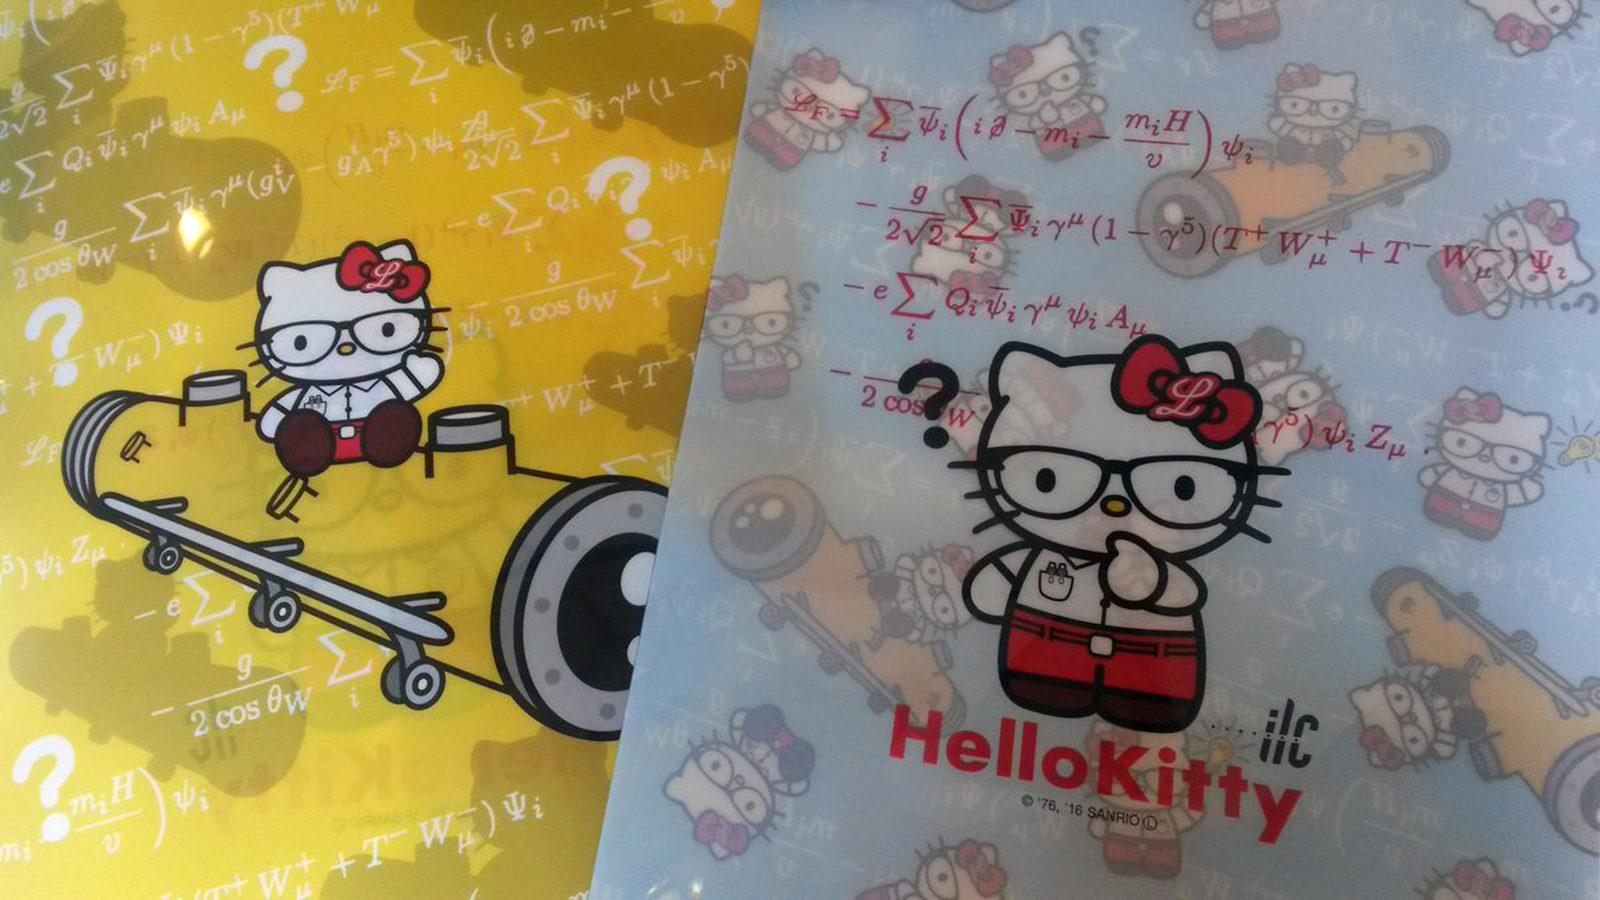 Image: Helly Kitty folders